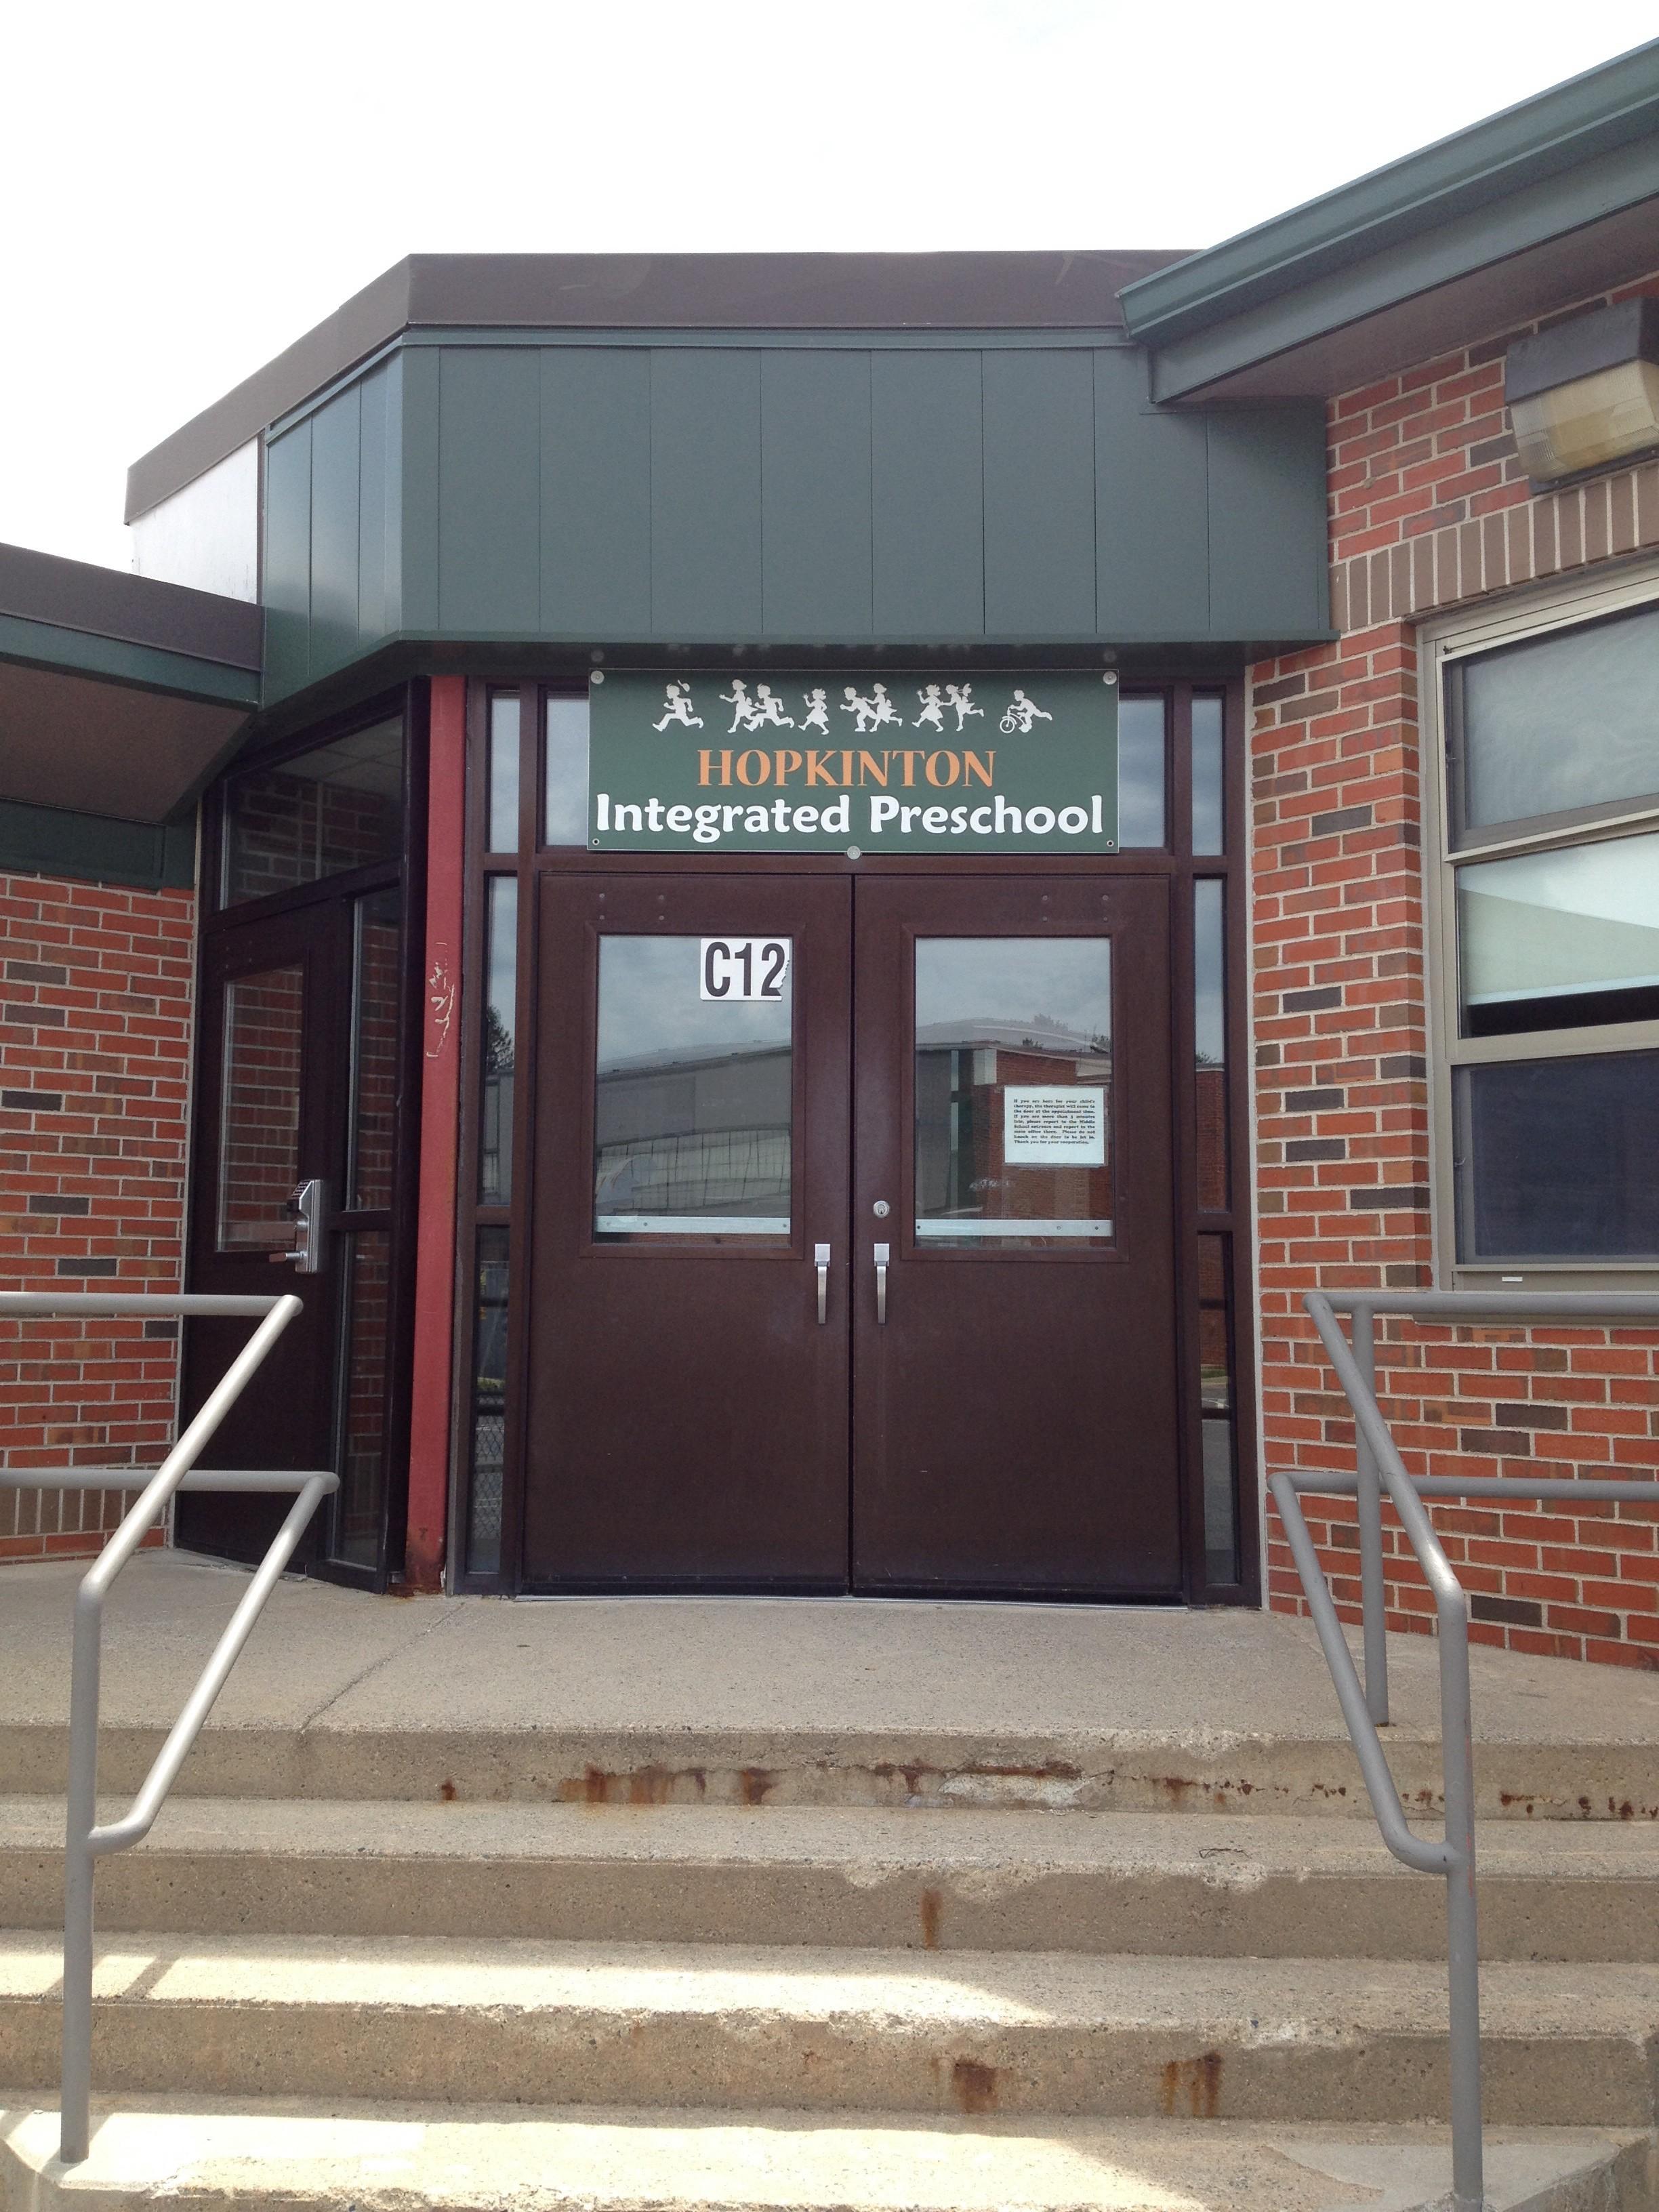 Hopkinton Integrated Preschool